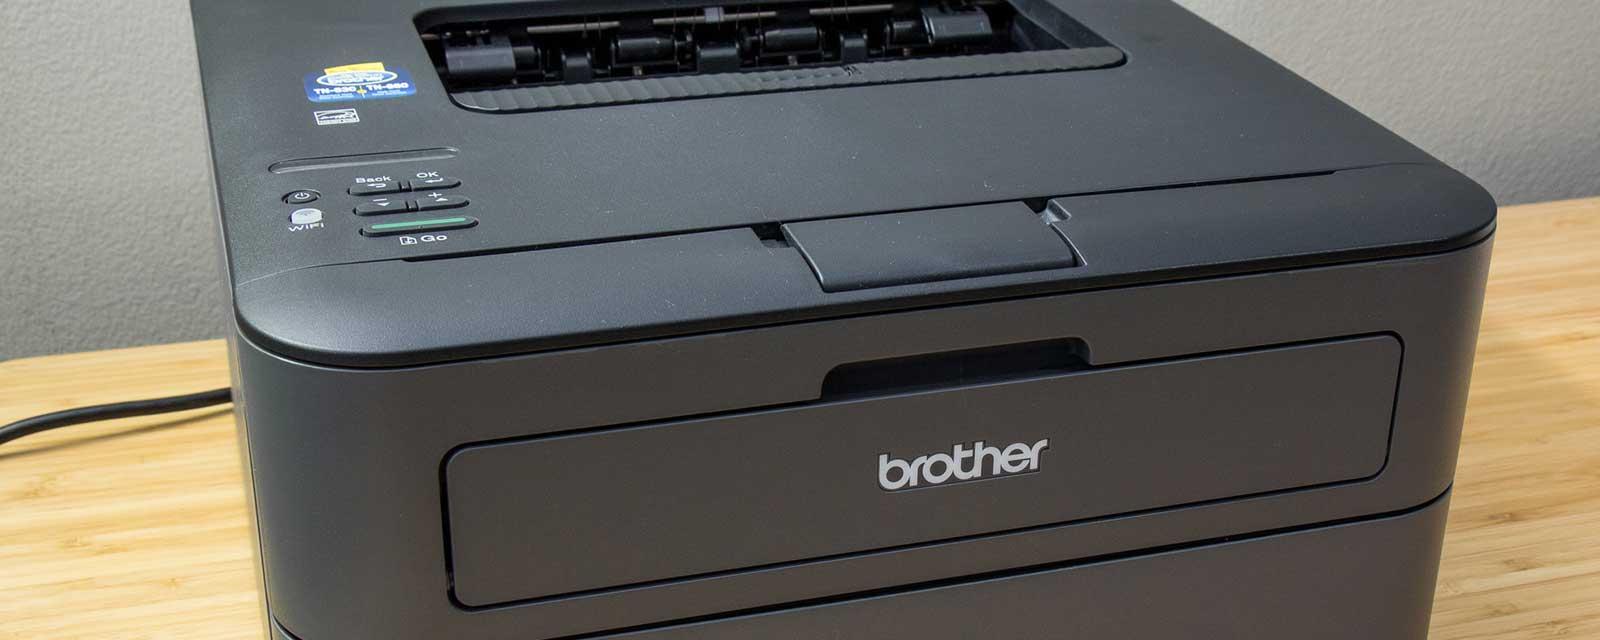 Laser Printer Repairs Services in Sydney